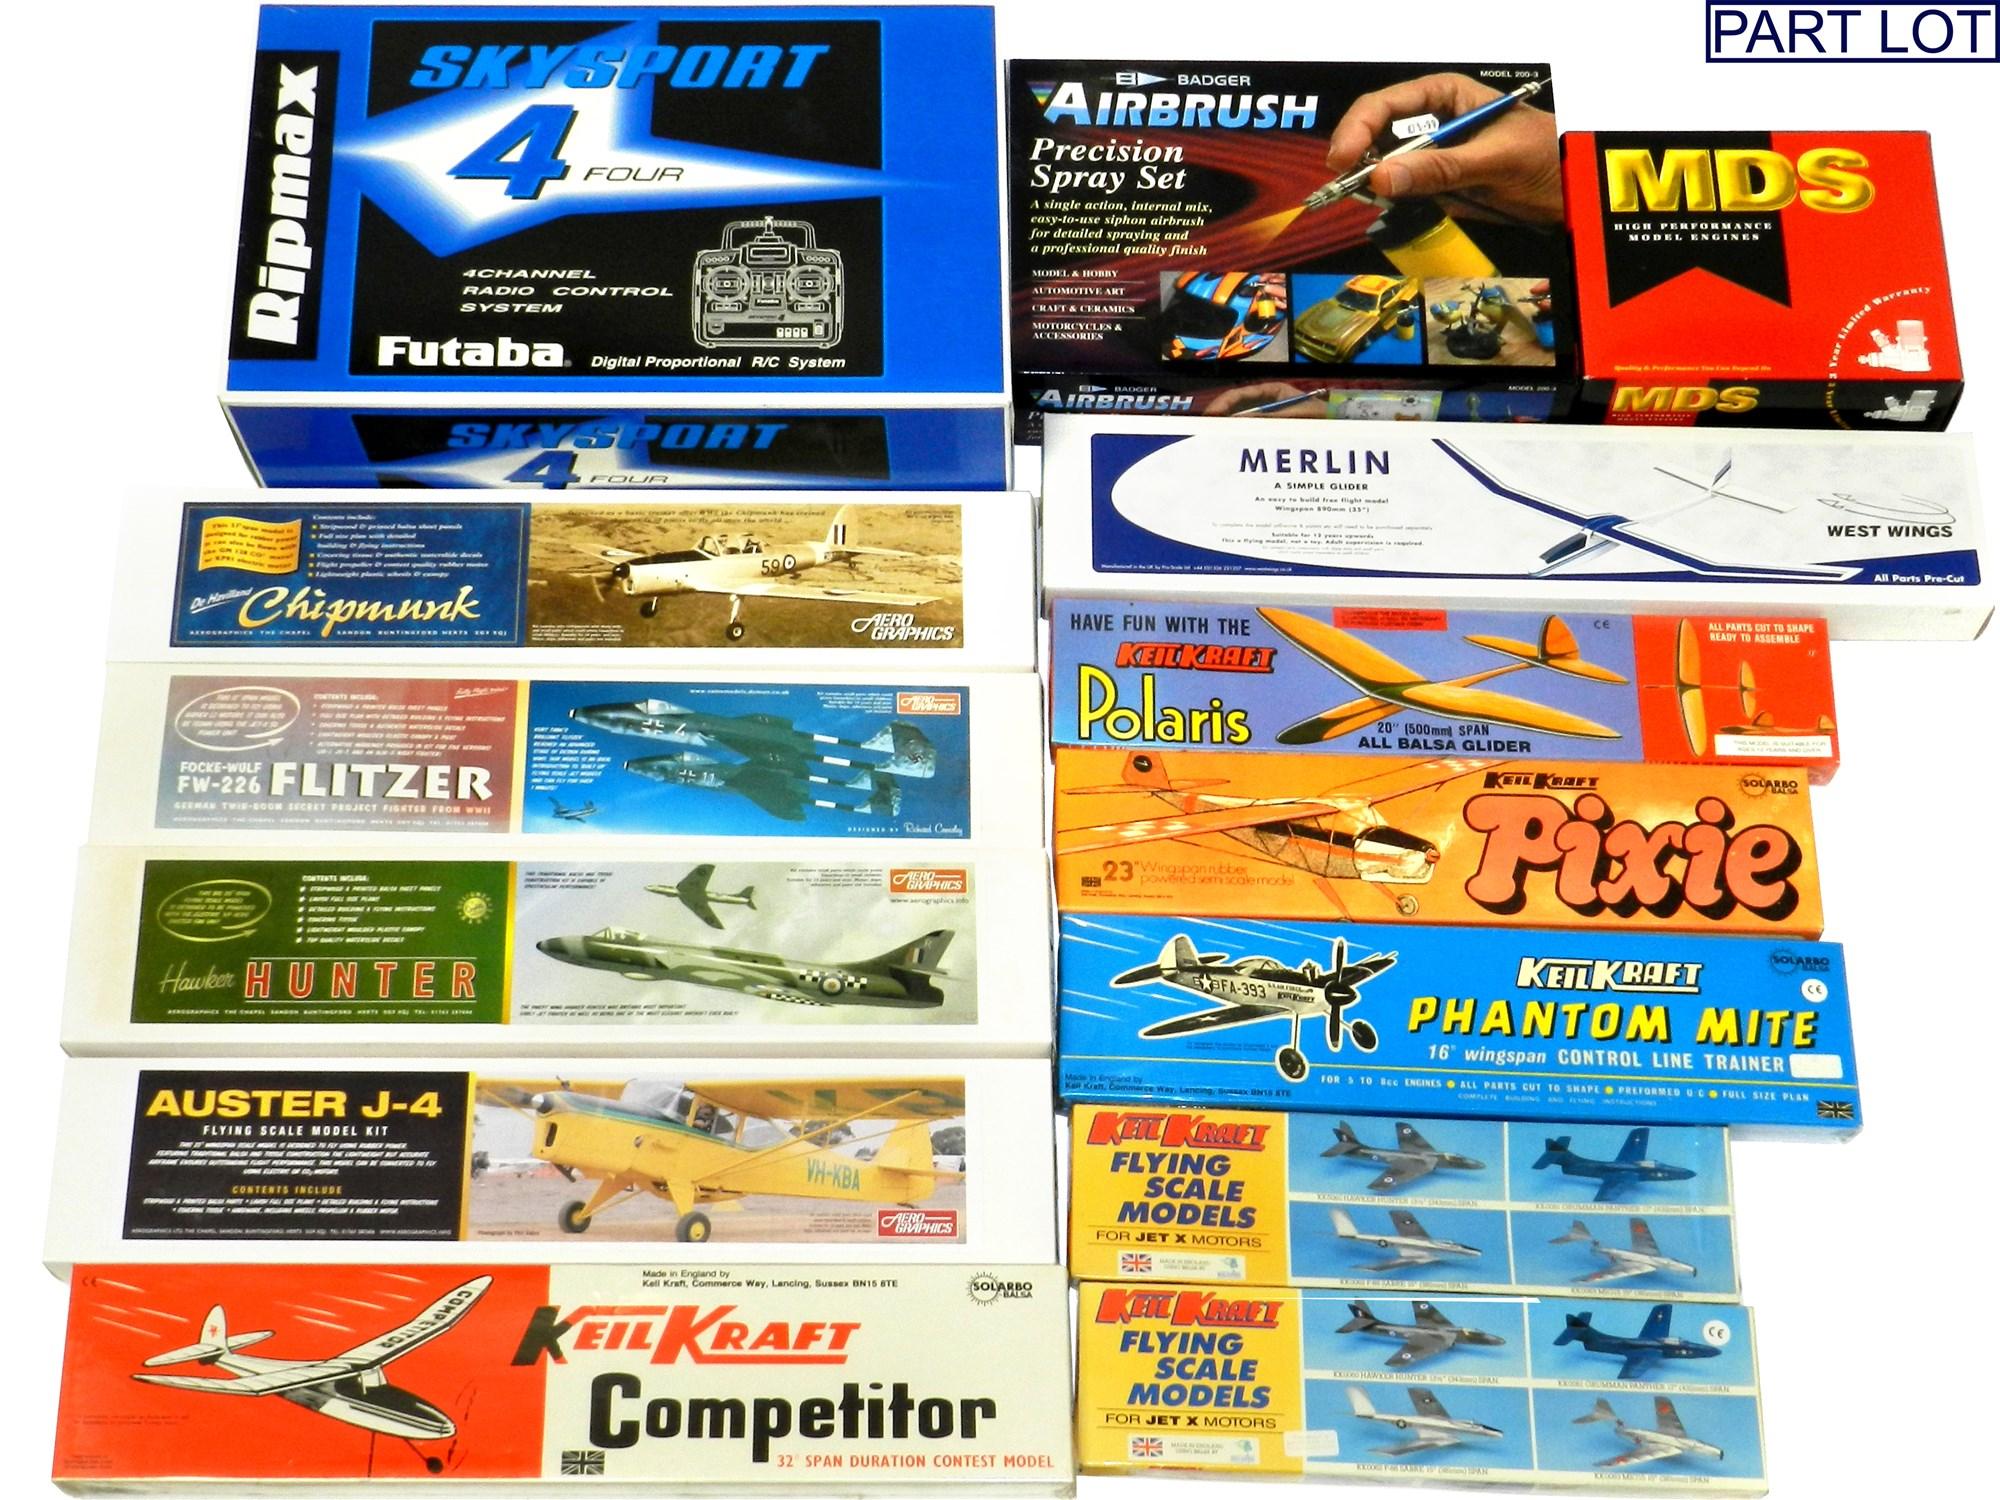 Lot 330 16 Vintage Keilkraft Model Aircraft Kits